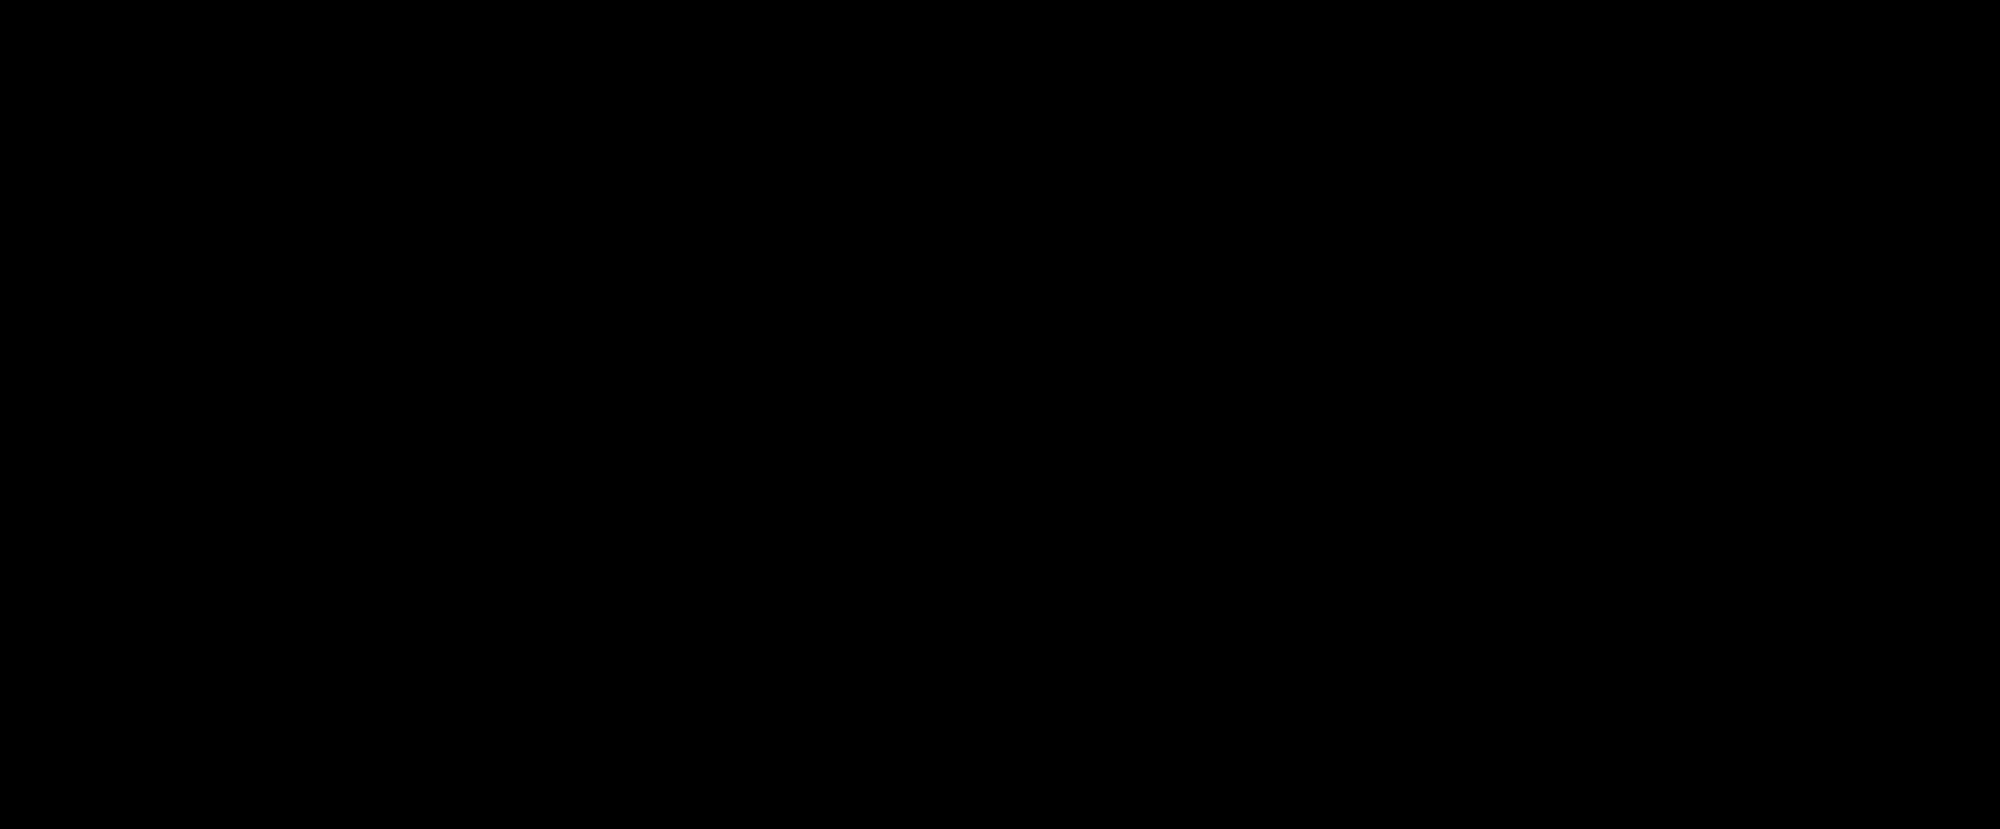 Paraphrase Productions-logo-black (1).png